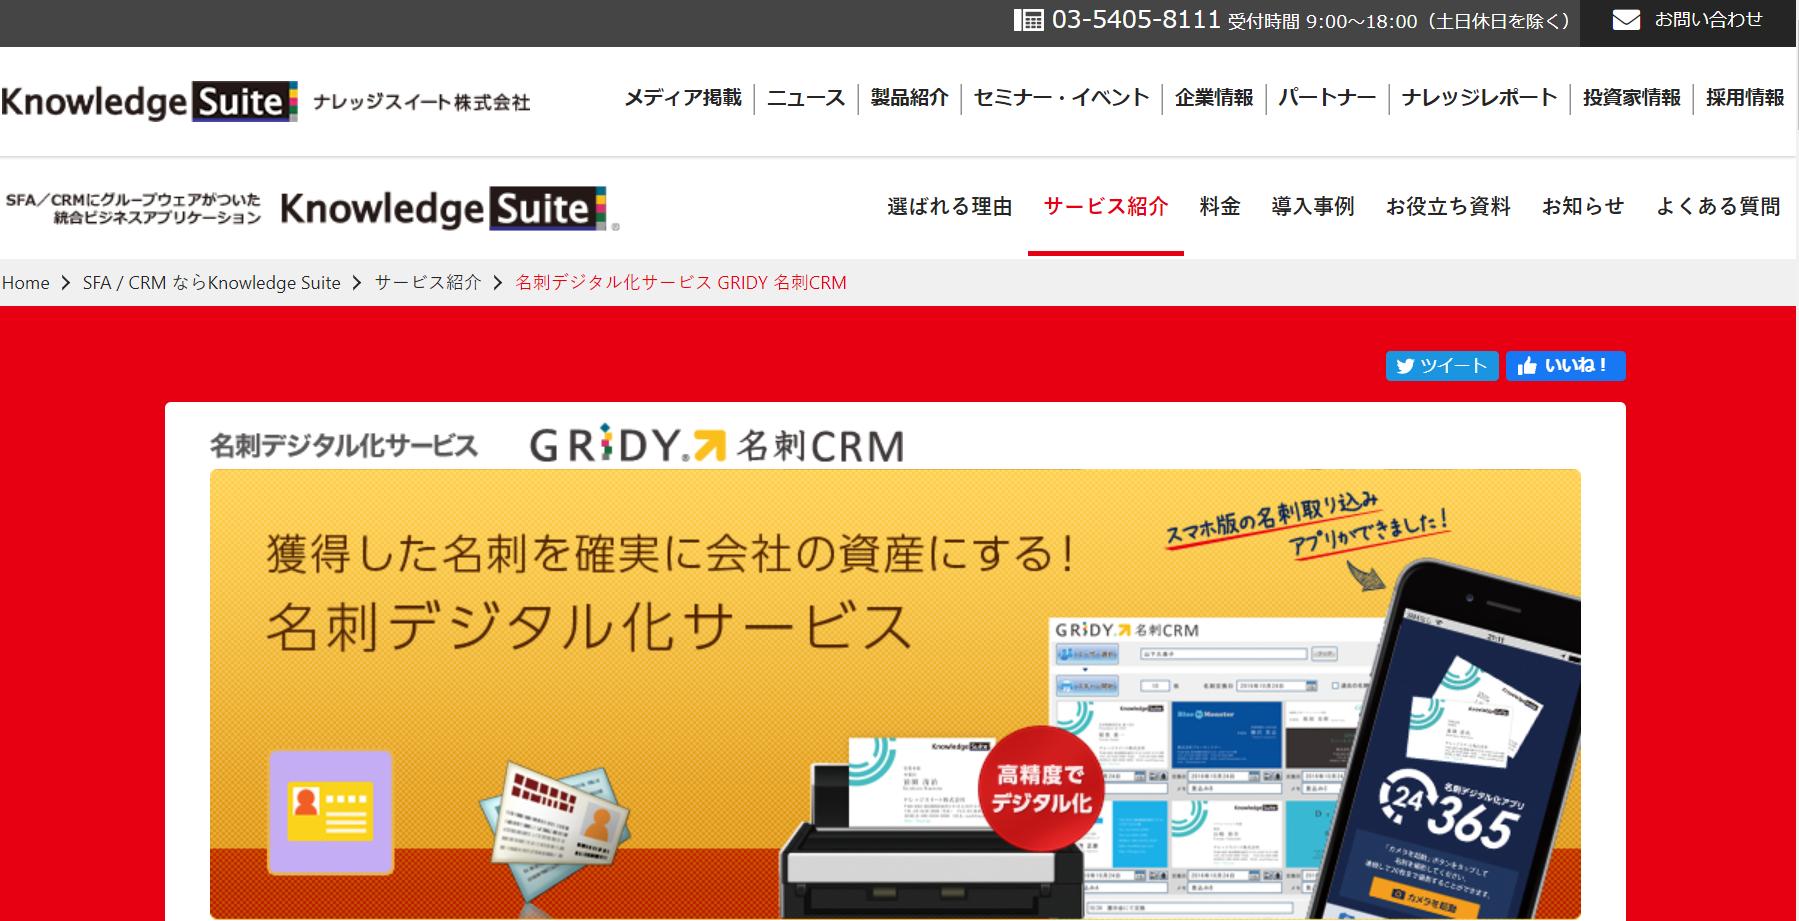 GRIDY 名刺CRM